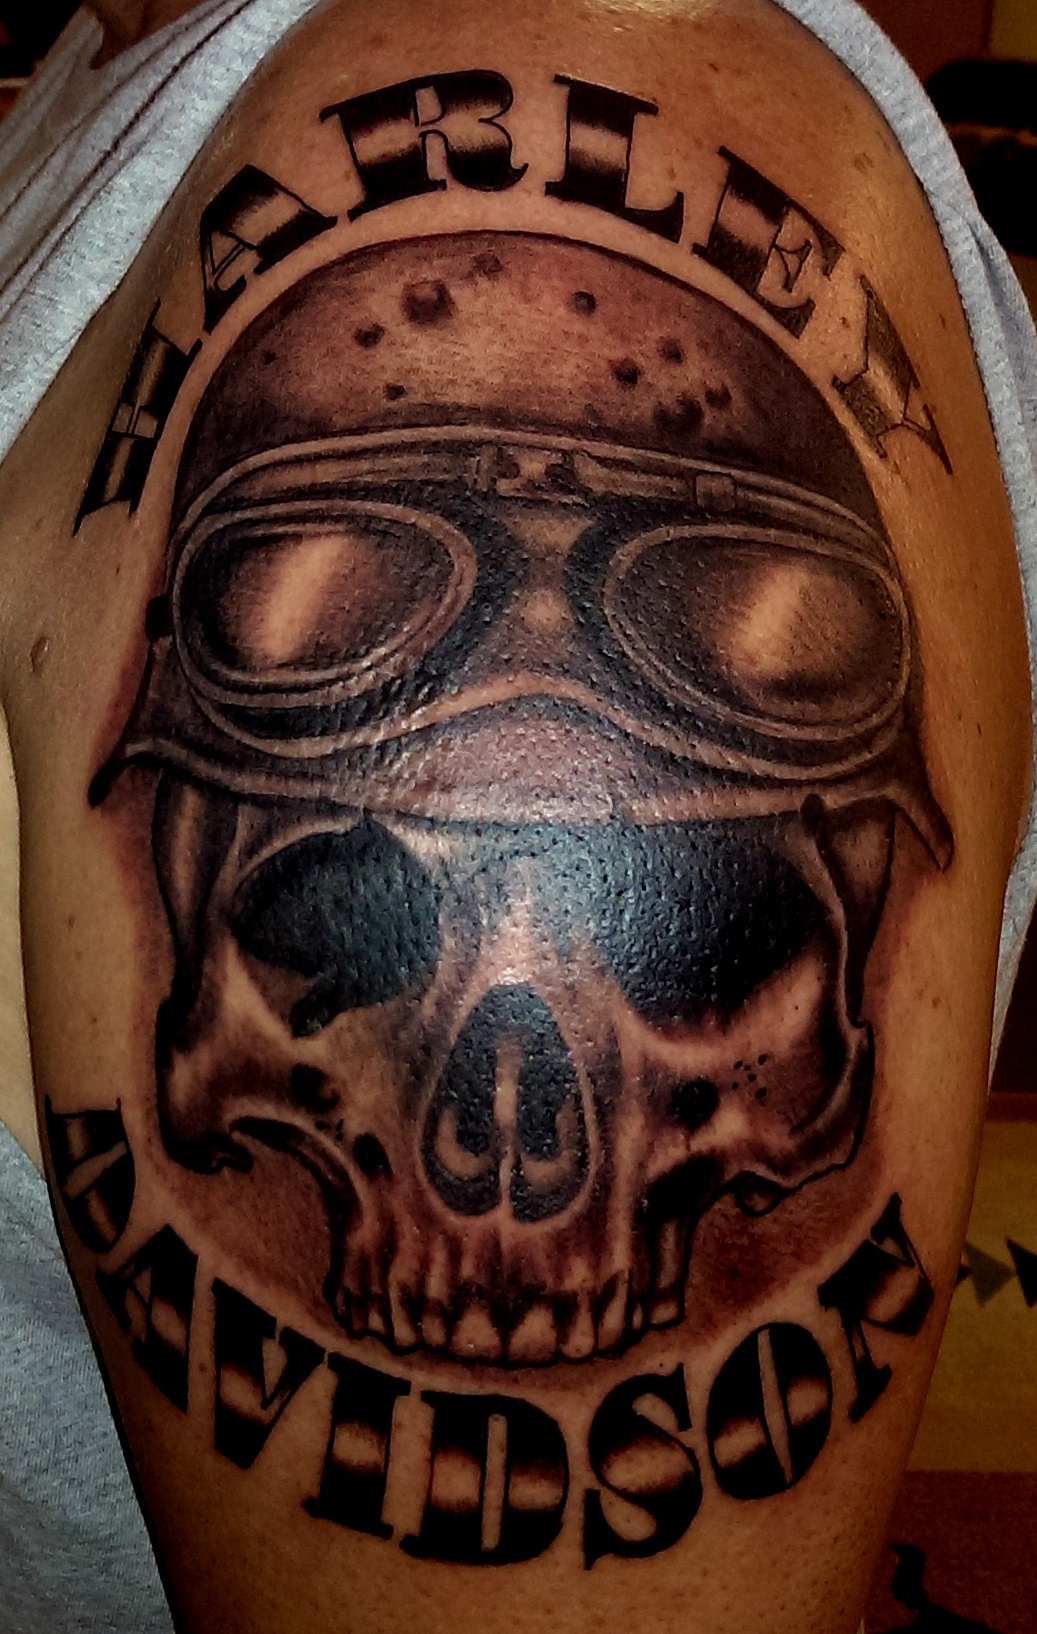 White buffalo custom tattoos body piercing dunnellon for Harley skull tattoos